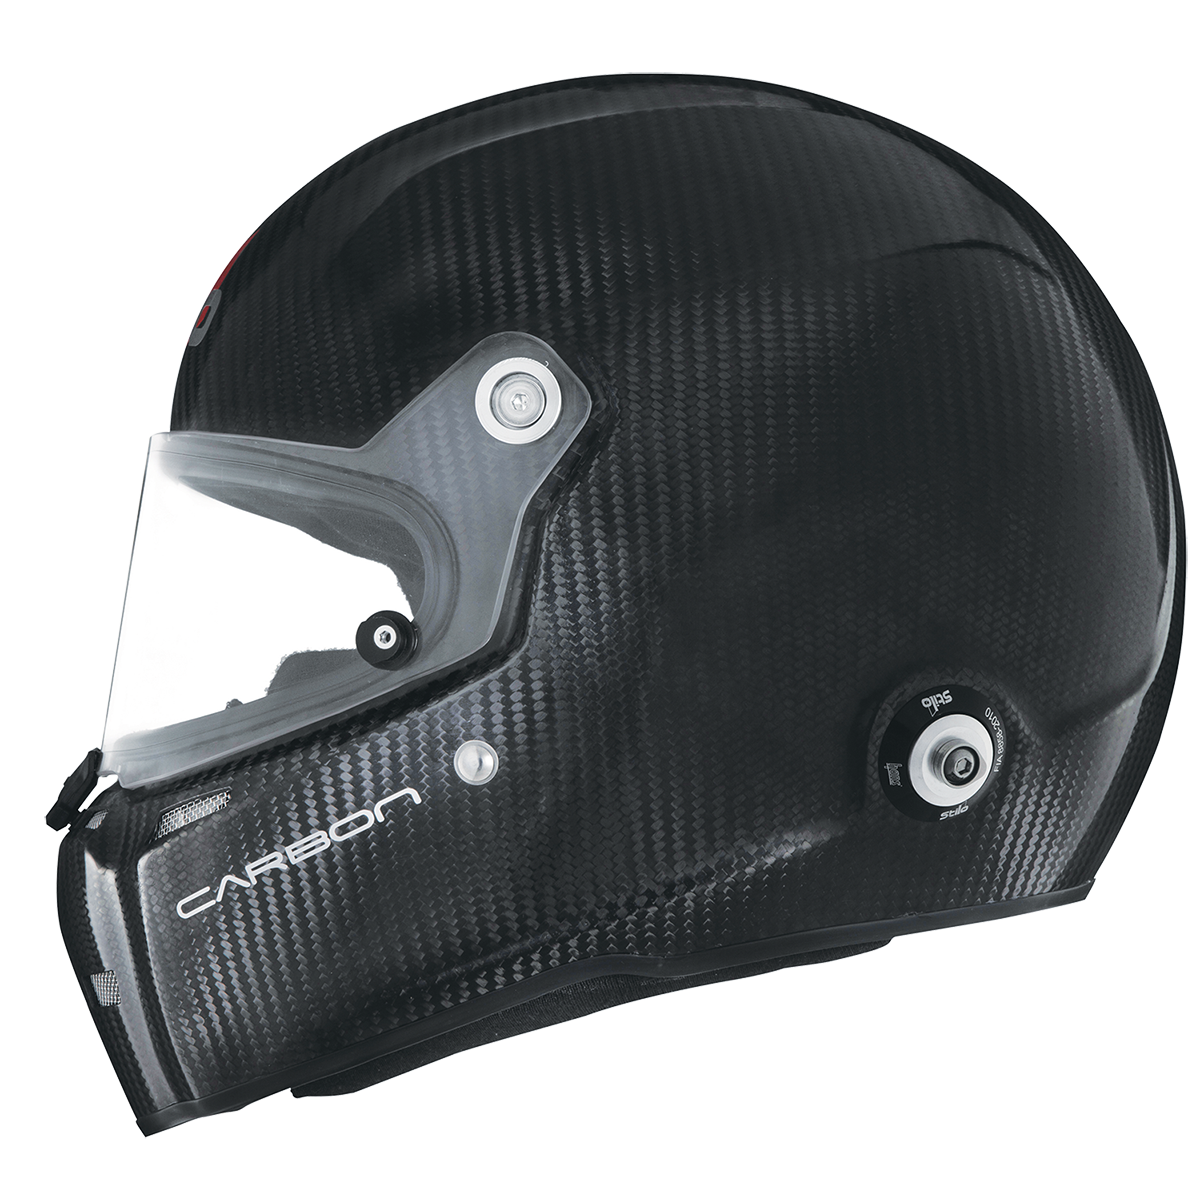 Stilo st f carbon. Racing helmet png